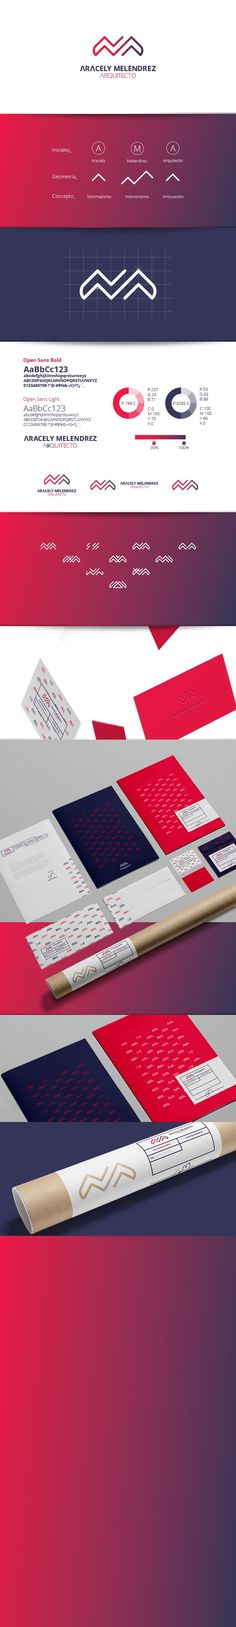 Aracely Melendrez Arquitecto - Identity Branding, Graphic Design, Pattern Design: